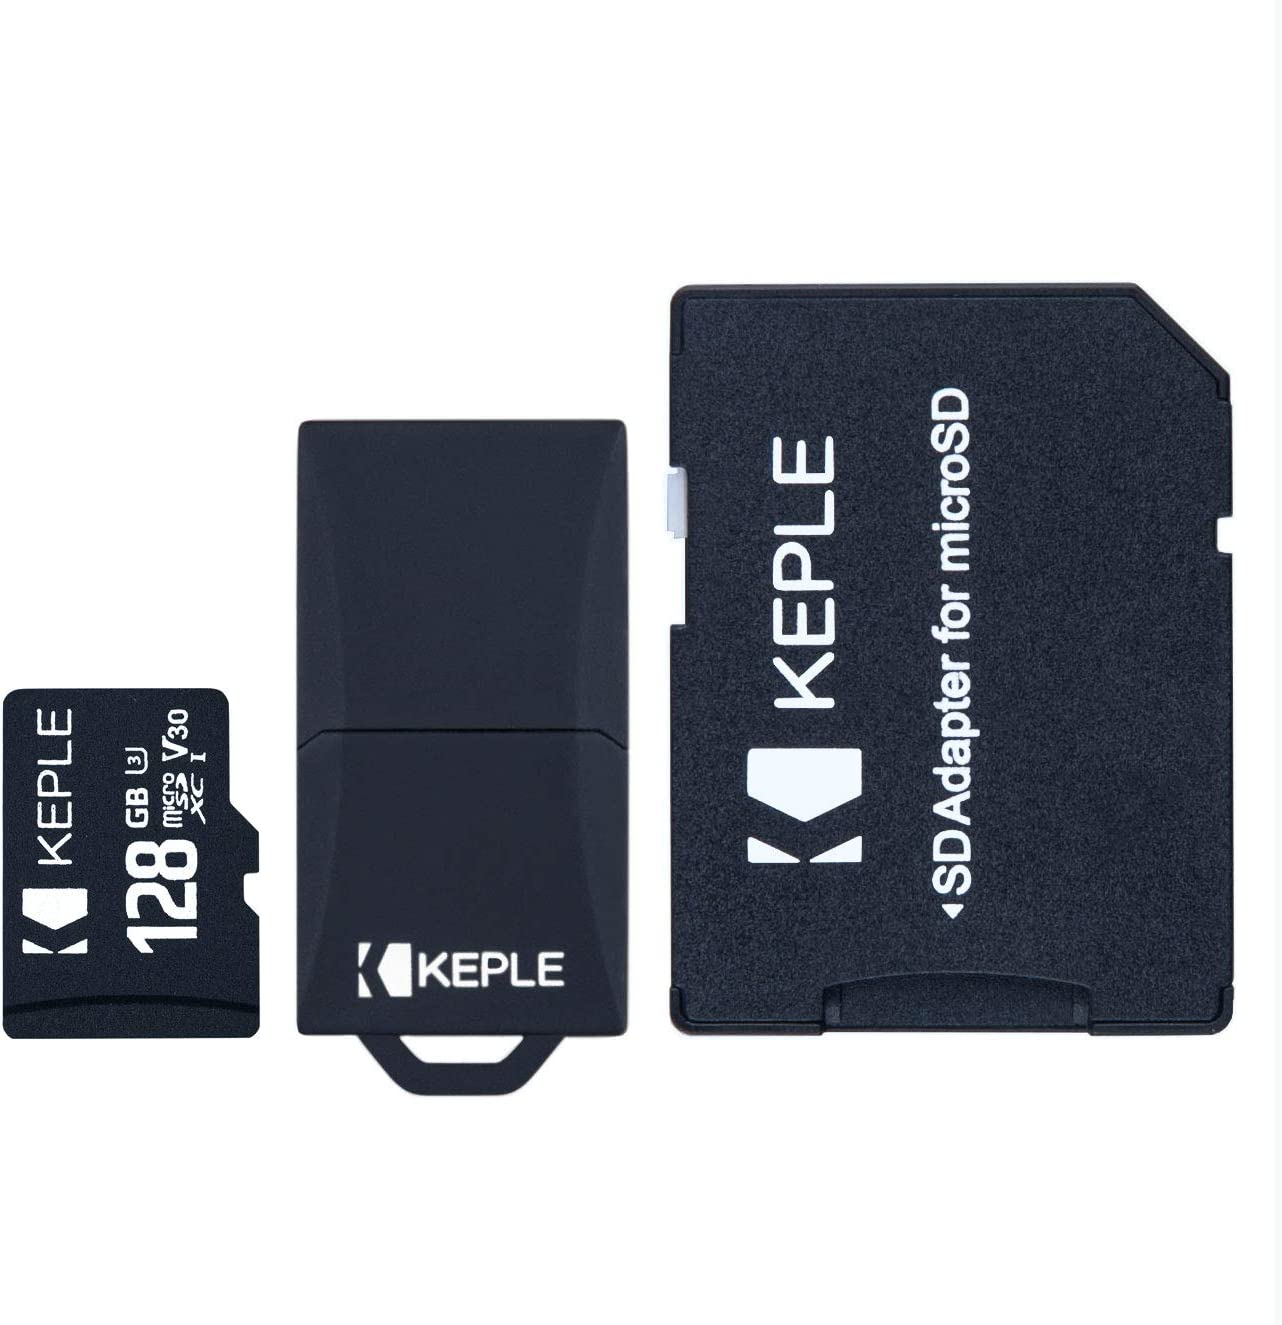 128GB microSD Memory Card Micro SD Compatible with LG K30, K8 (2018), Q6, Q8 (2017), V30, G6, Stylus 3, K20 Plus, X4+, Harmony, Stylo 3 Plus, X Venture, G Pad IV 8.0 FHD Mobile Phone | 128 GB